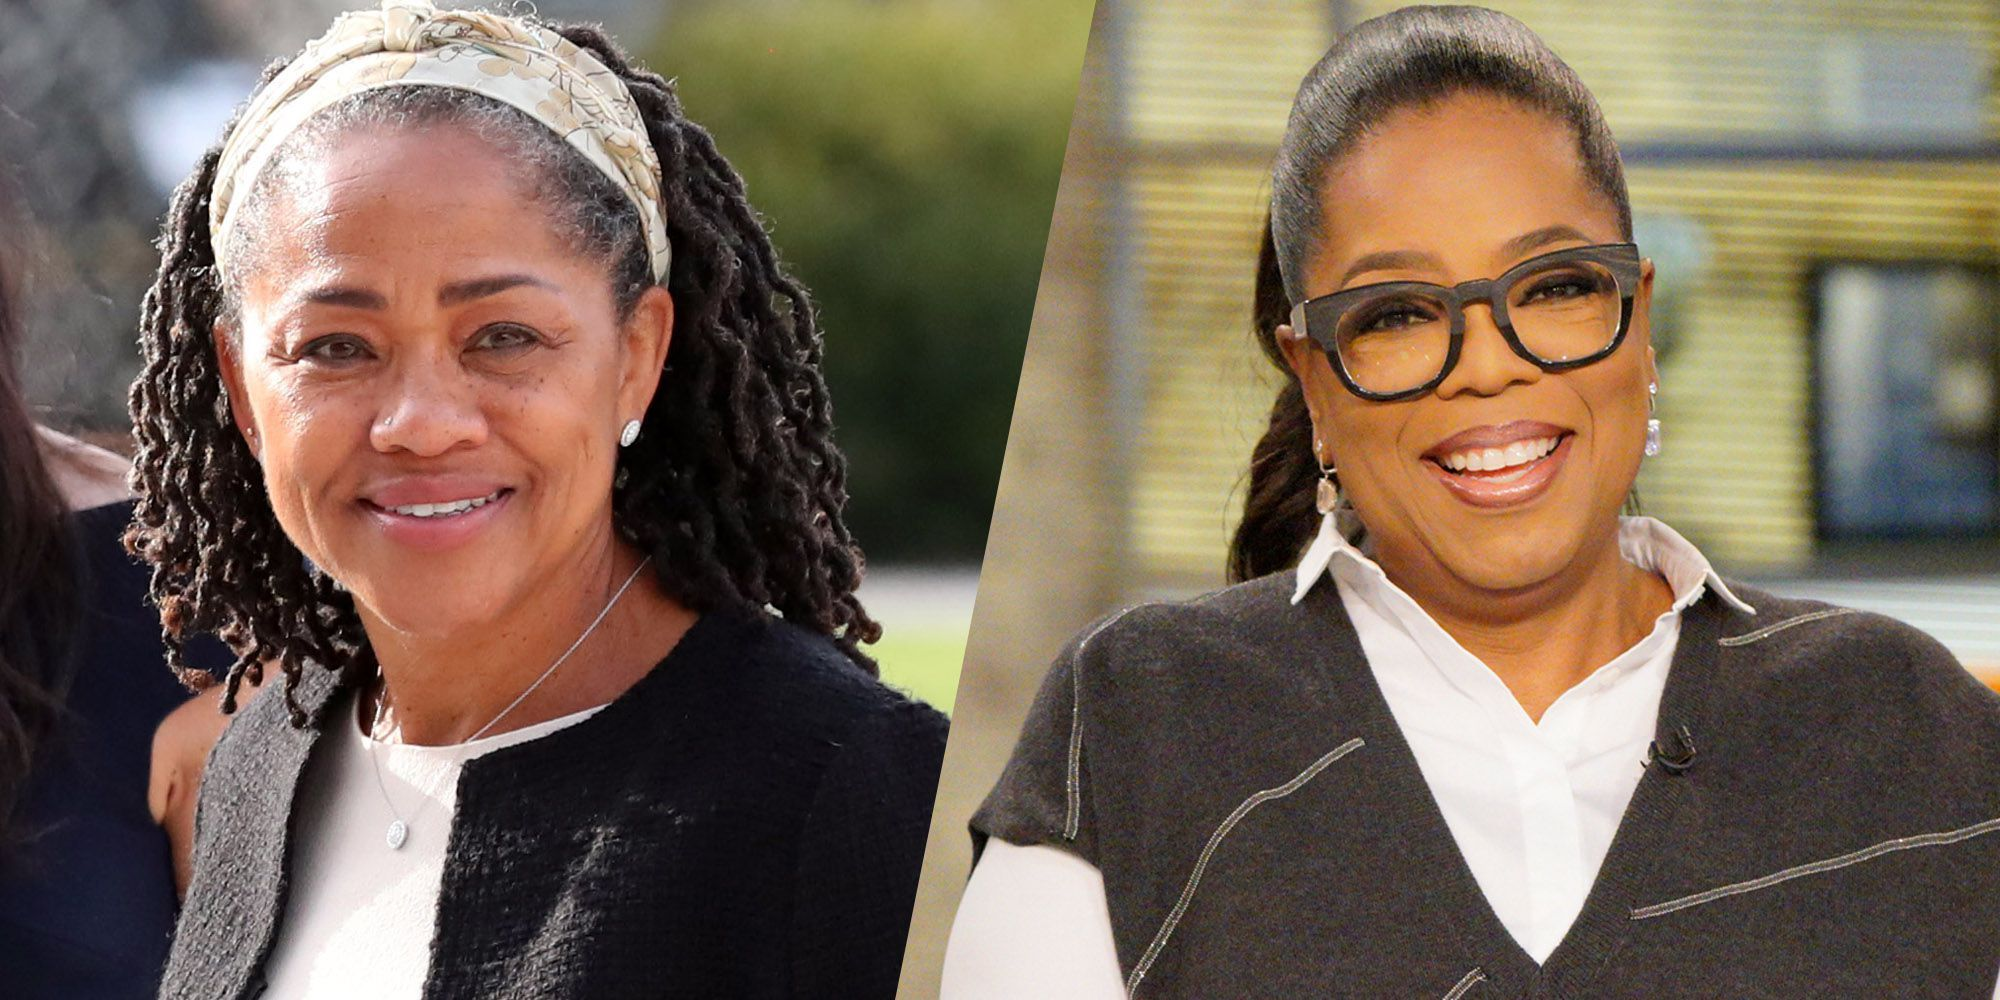 Oprah Winfrey Gave Meghan Markle S Mom The Sweetest Gifts Doria Ragland Friendship